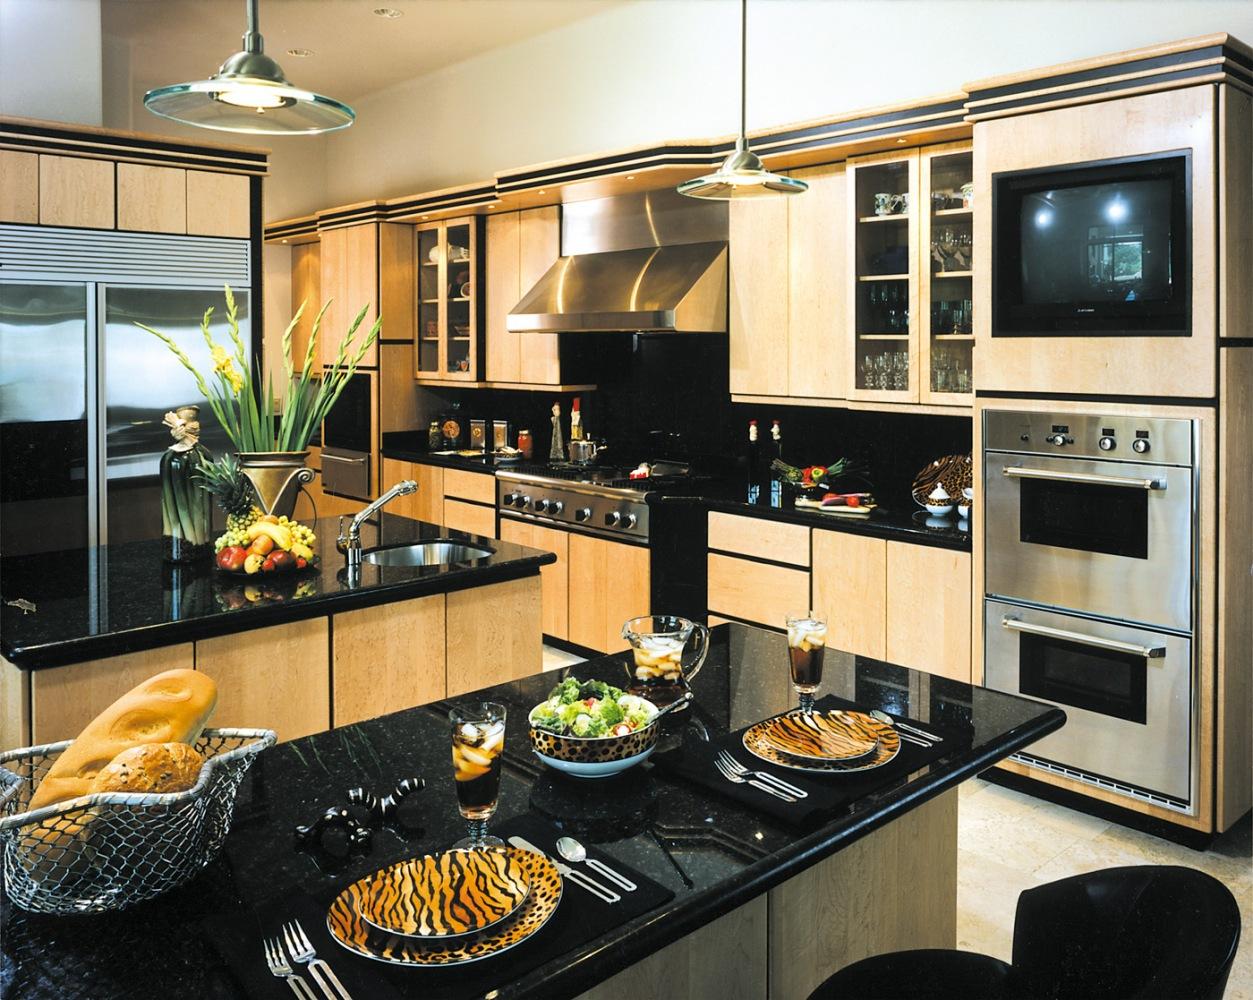 5500-Isleworth-Country-Club-Drive-Kitchen-1-5.jpg